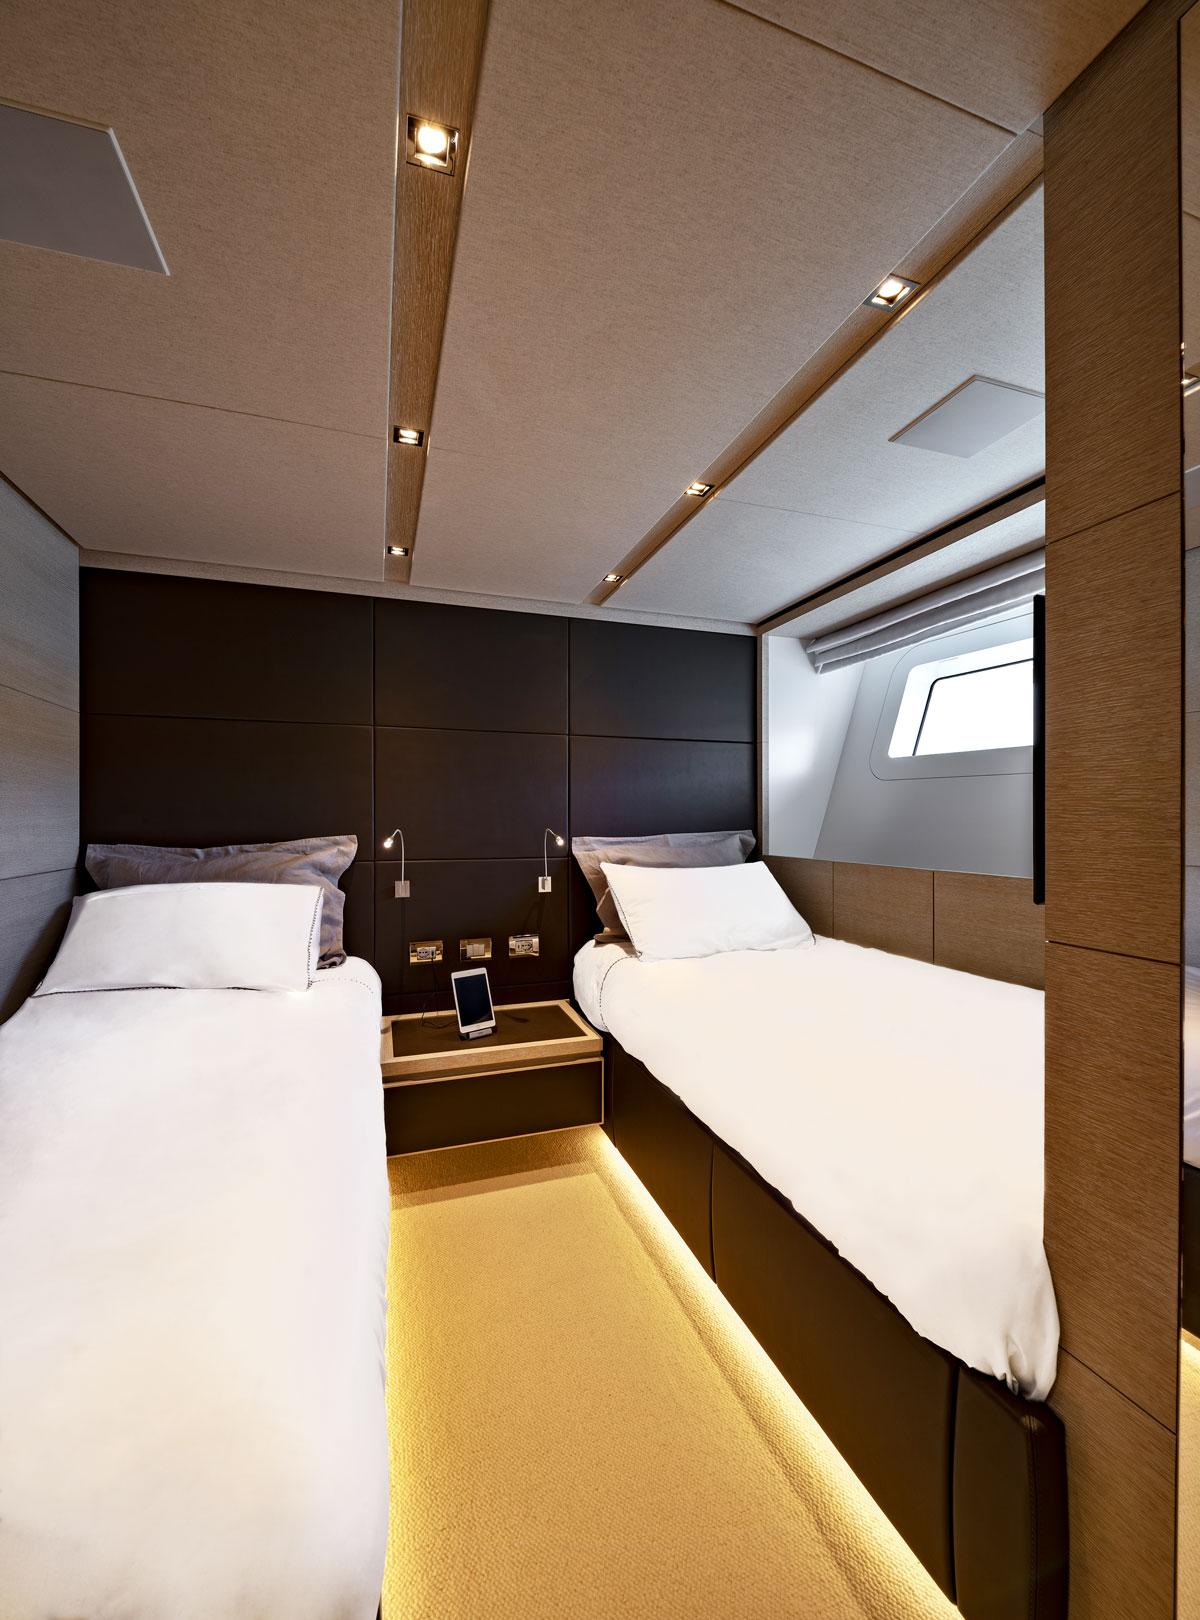 double cabin sd 112